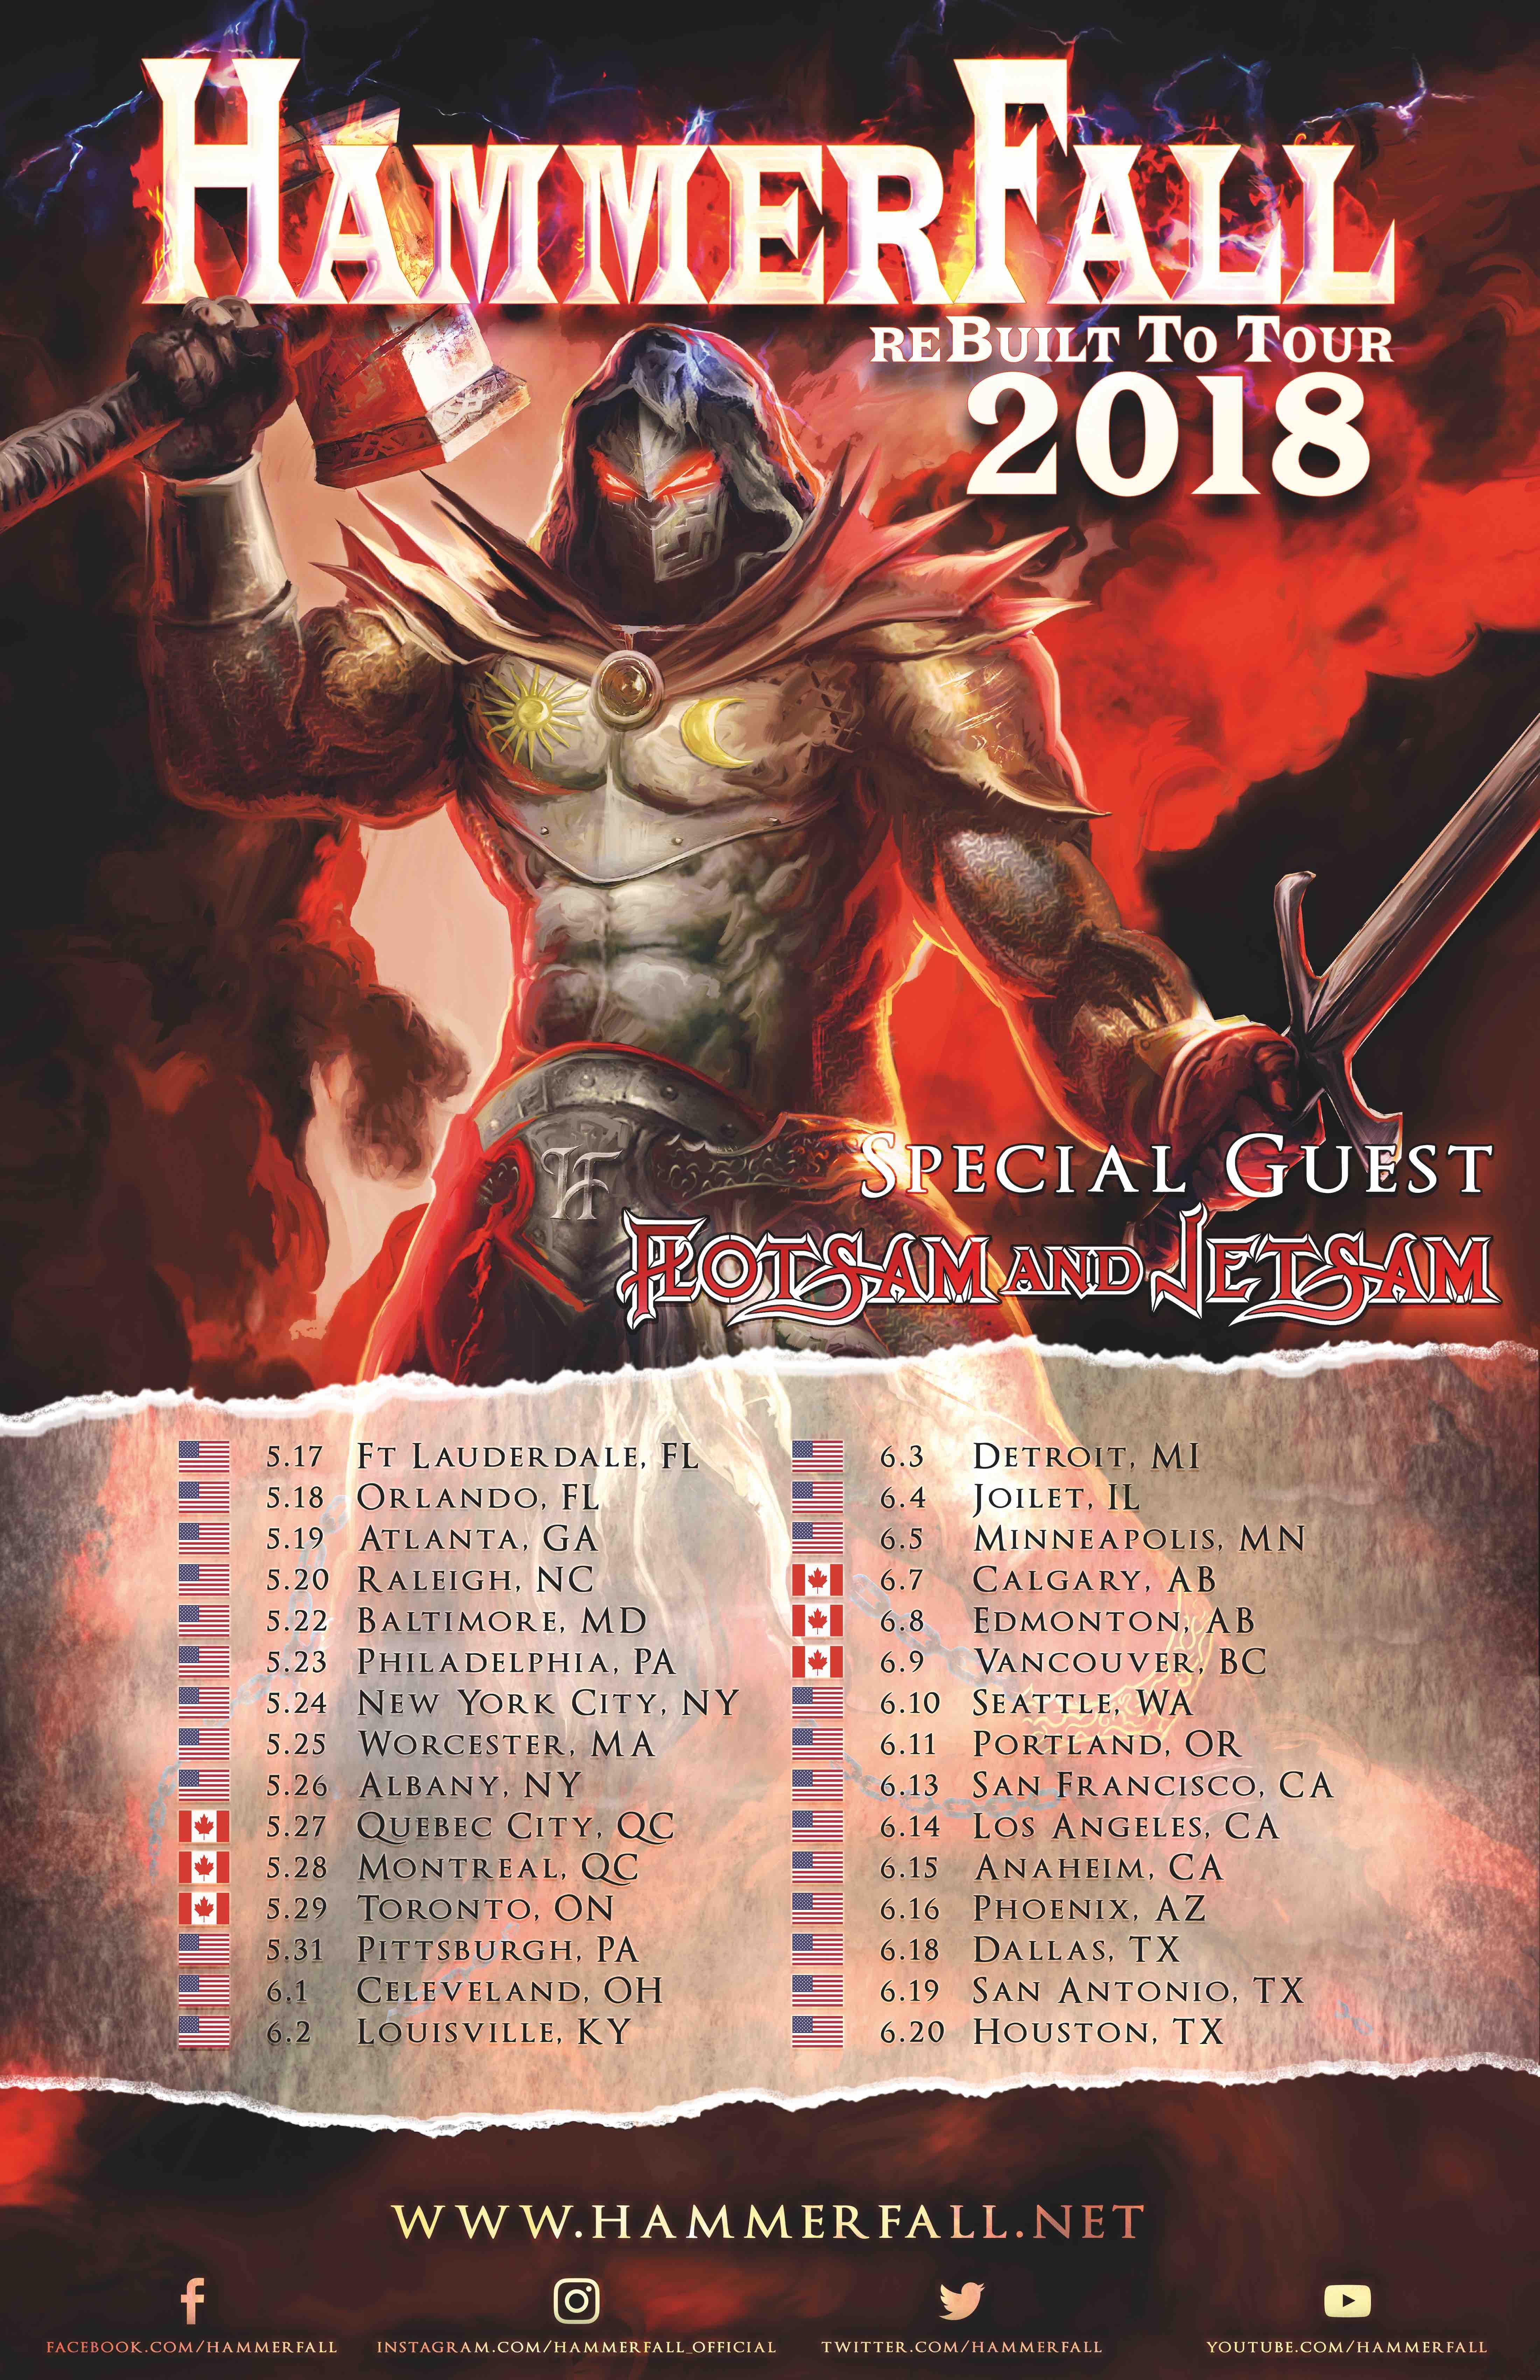 HAMMERFALL Kick Off North American Tour Tonight - Side Stage Magazine